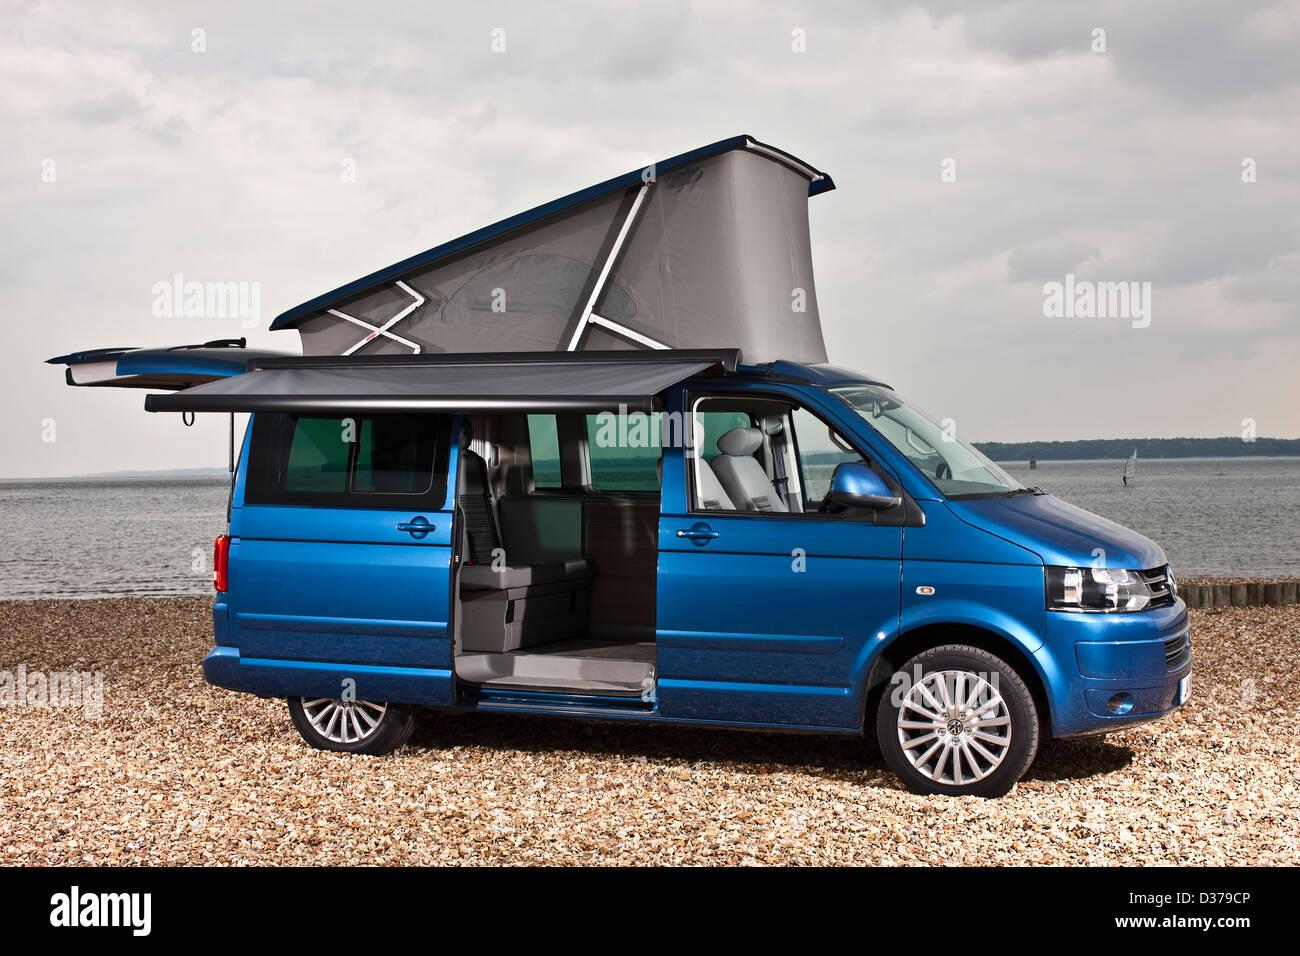 Blue metallic VW California campervan with optional awning on Southampton beach, UK, 07 05 2010 - Stock Image